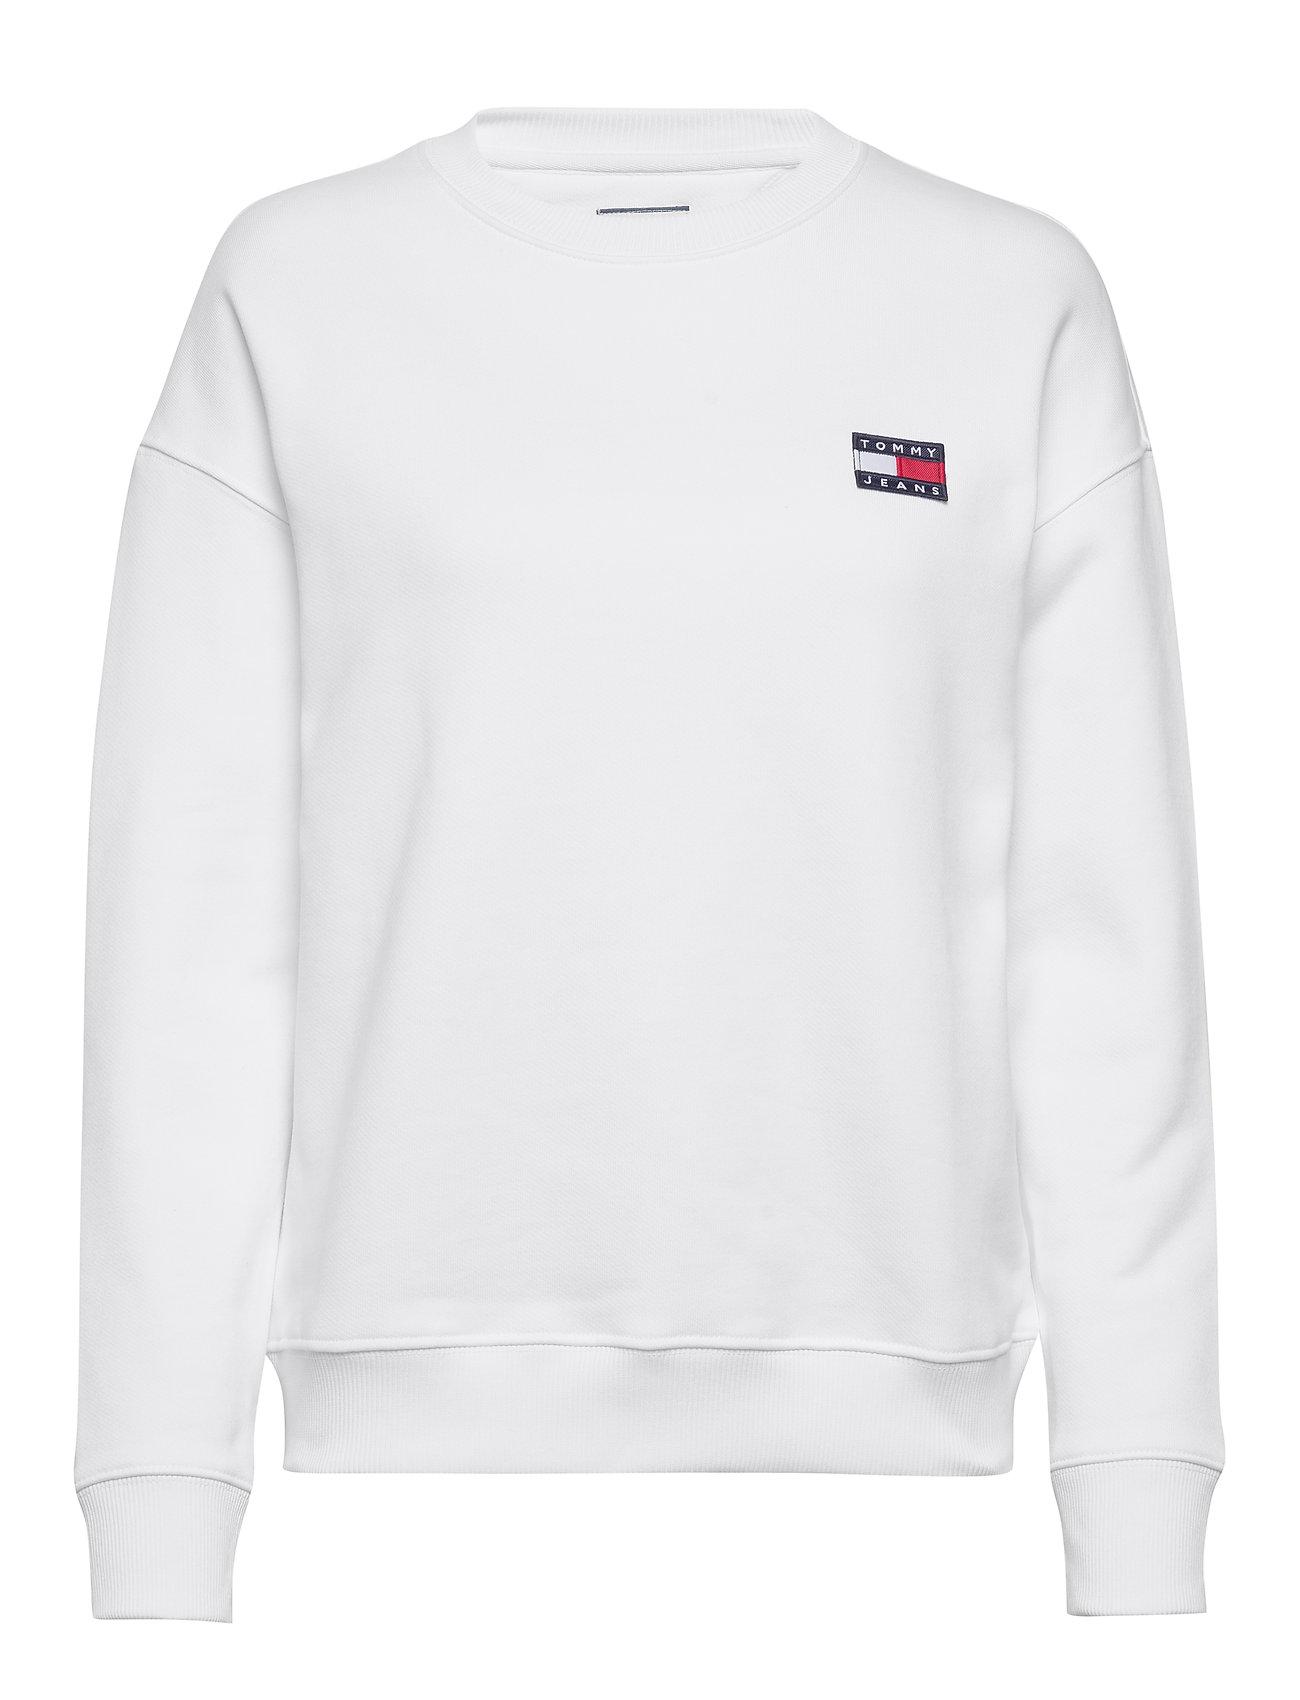 Image of Tjw Tommy Badge Crew Sweatshirt Trøje Hvid Tommy Jeans (3418111697)